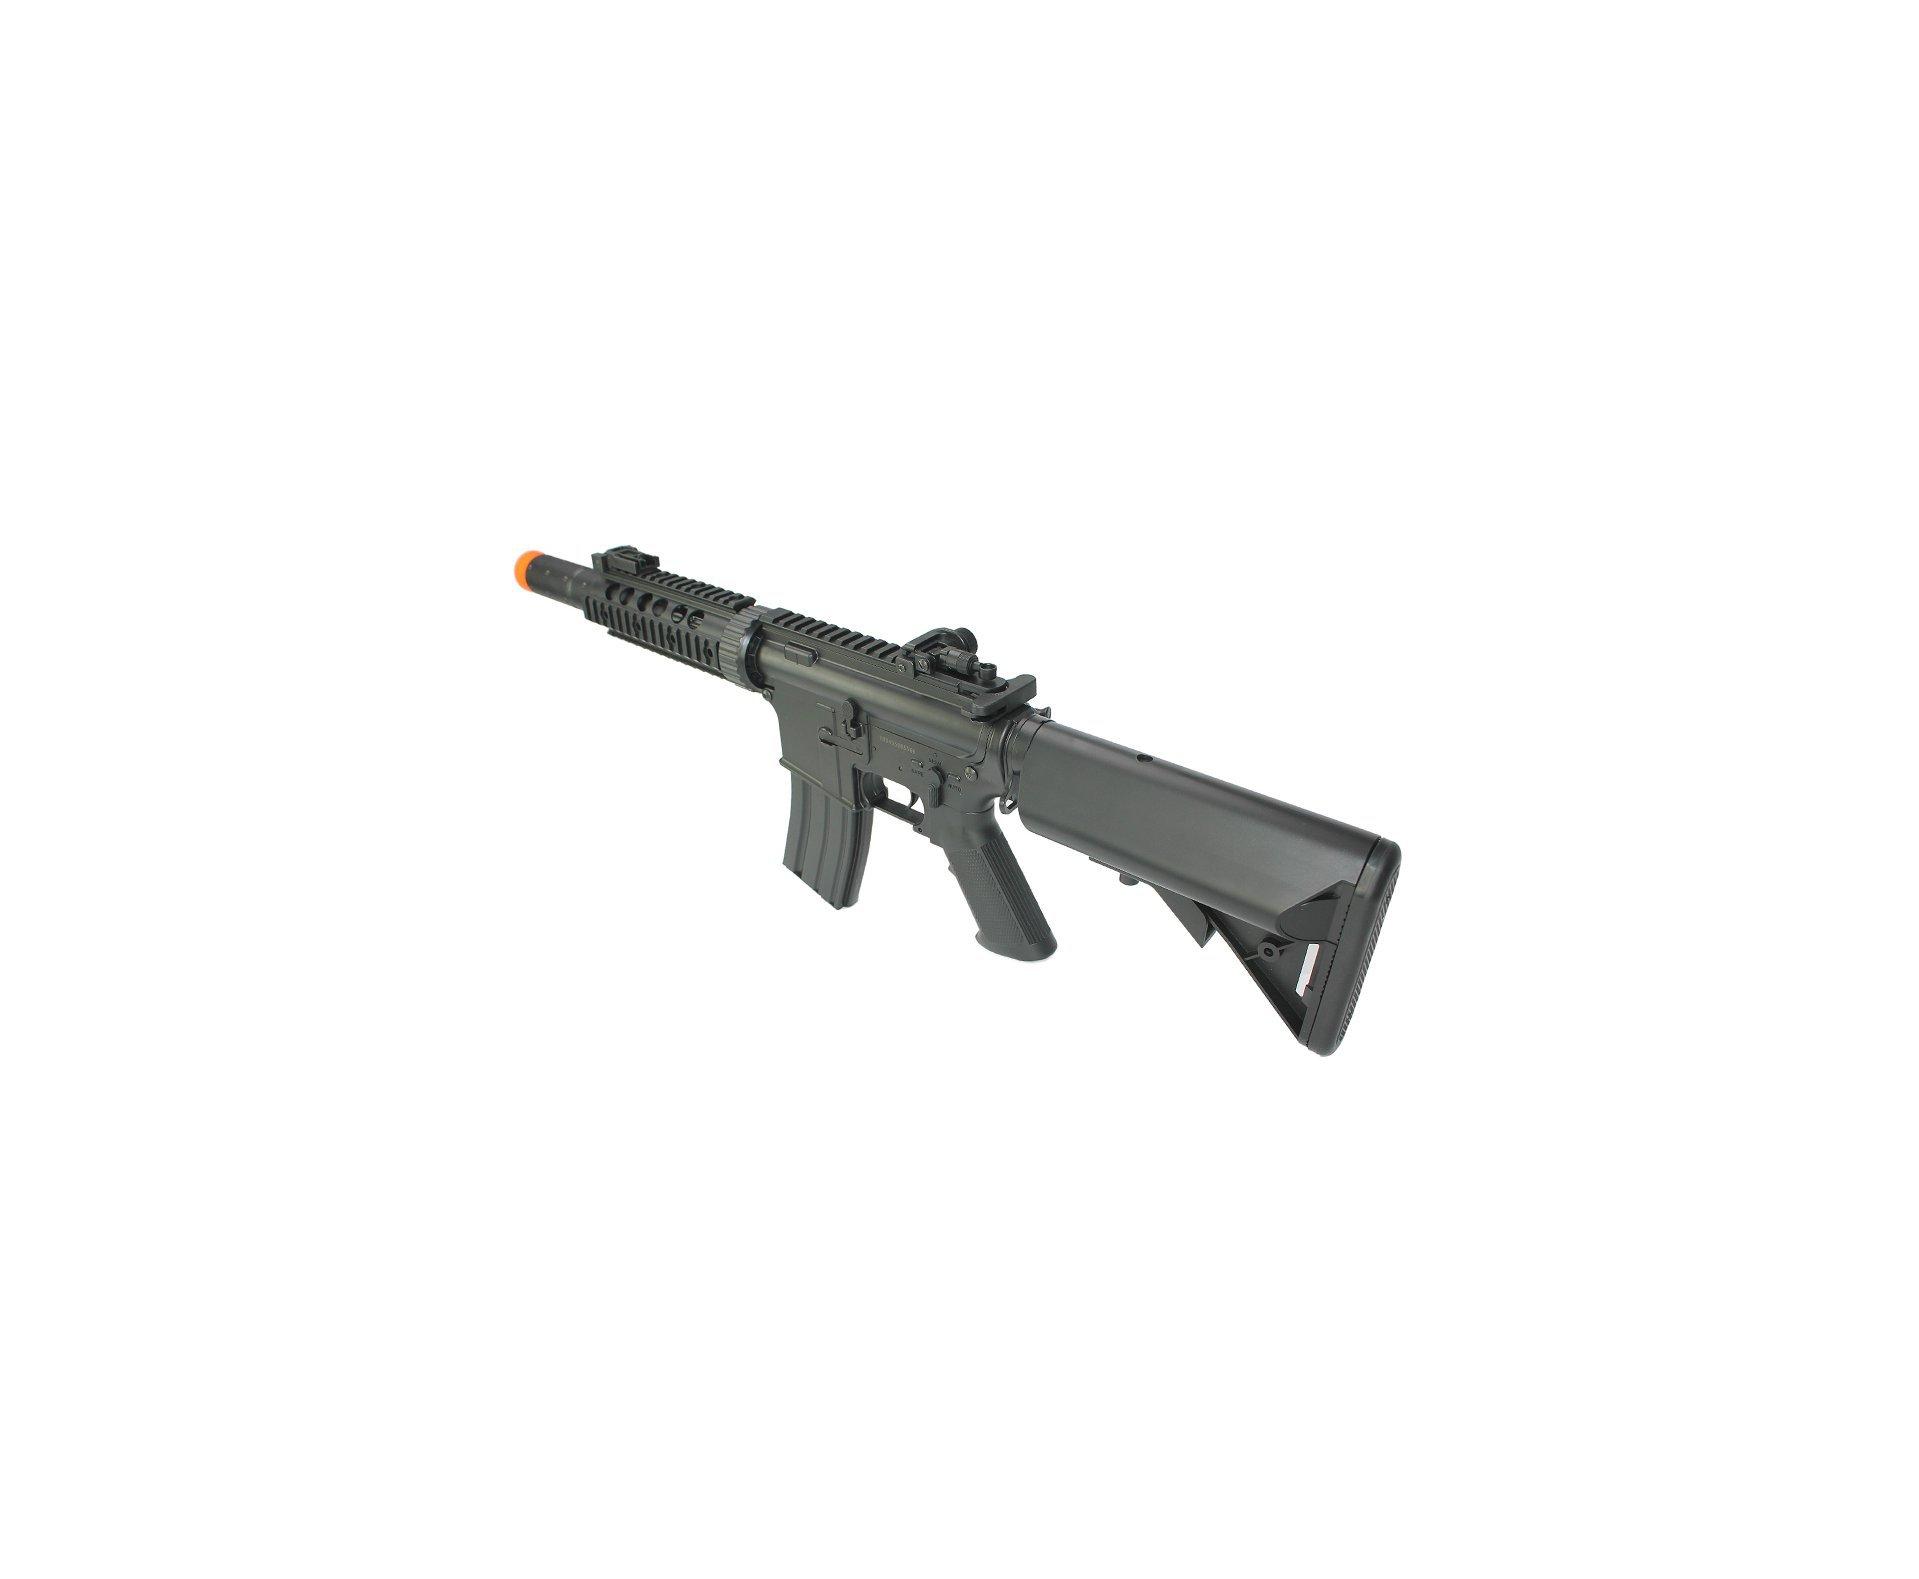 Rifle De Airsoft M4a1 Ris Black Cal 6mm - Eletrico - Bivolt + 4000 Esferas 0,20g + Capa - Cyma